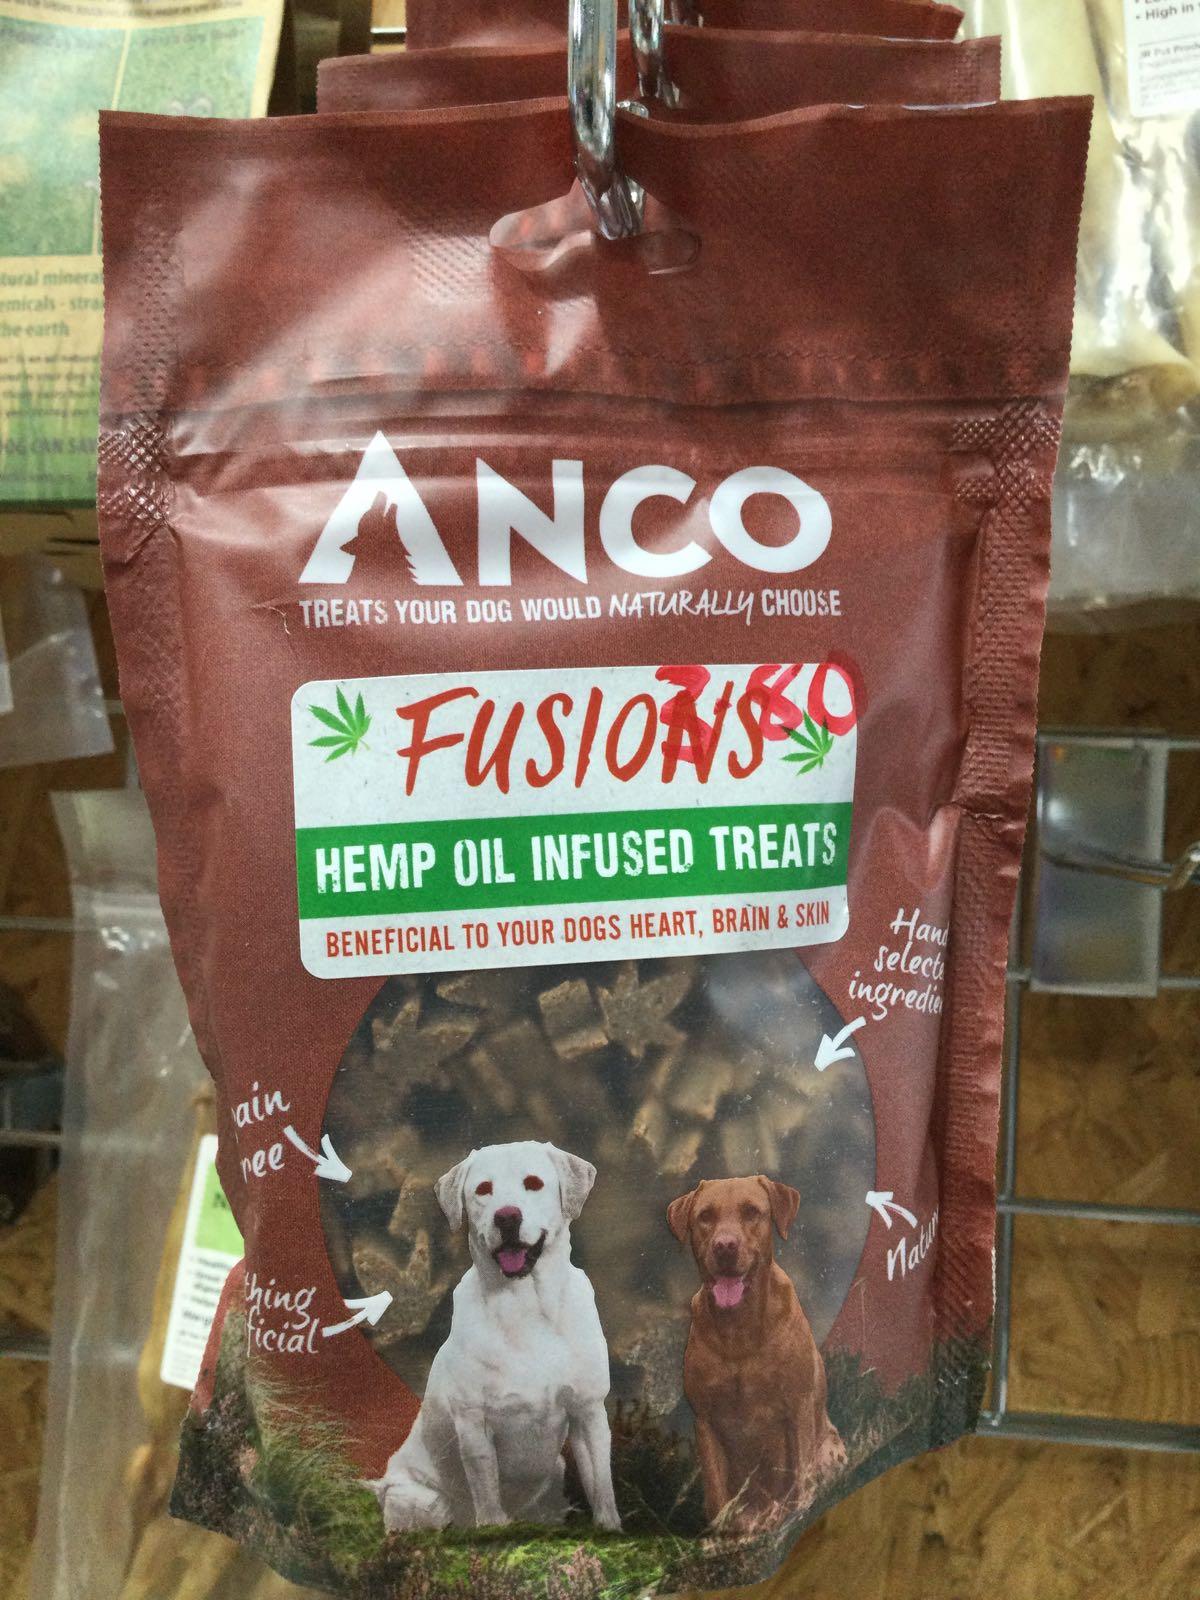 Anco Fusions- Hemp oil infused treats